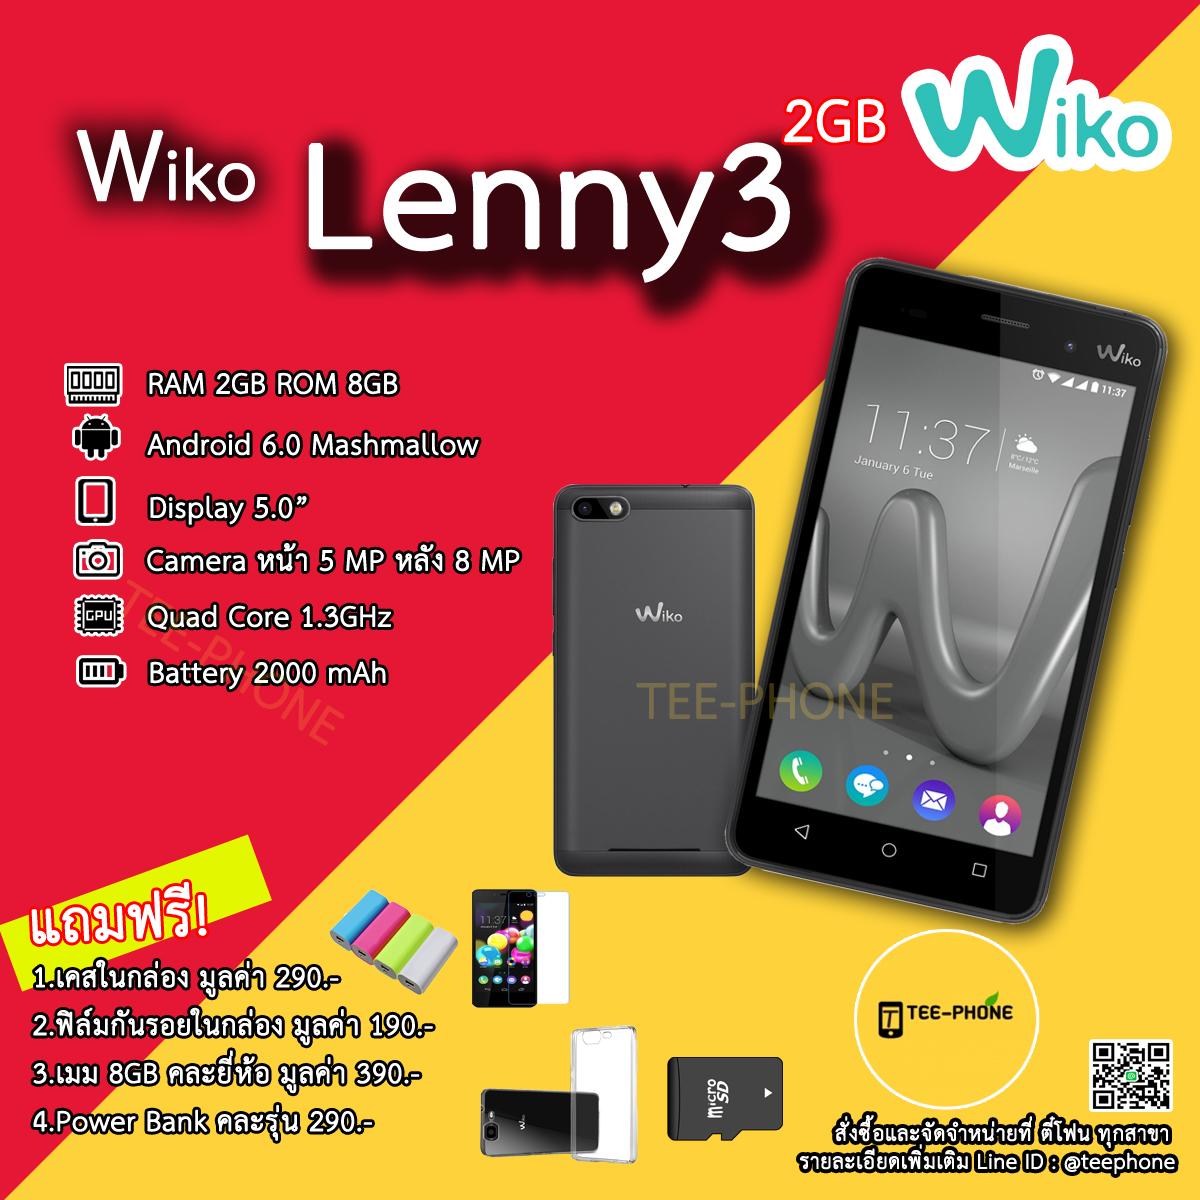 Wiko Lenny 3 2016 Metal RAM2GB 8GB แถมเมม8GB+ฟิล์มกันรอย+PowerBank